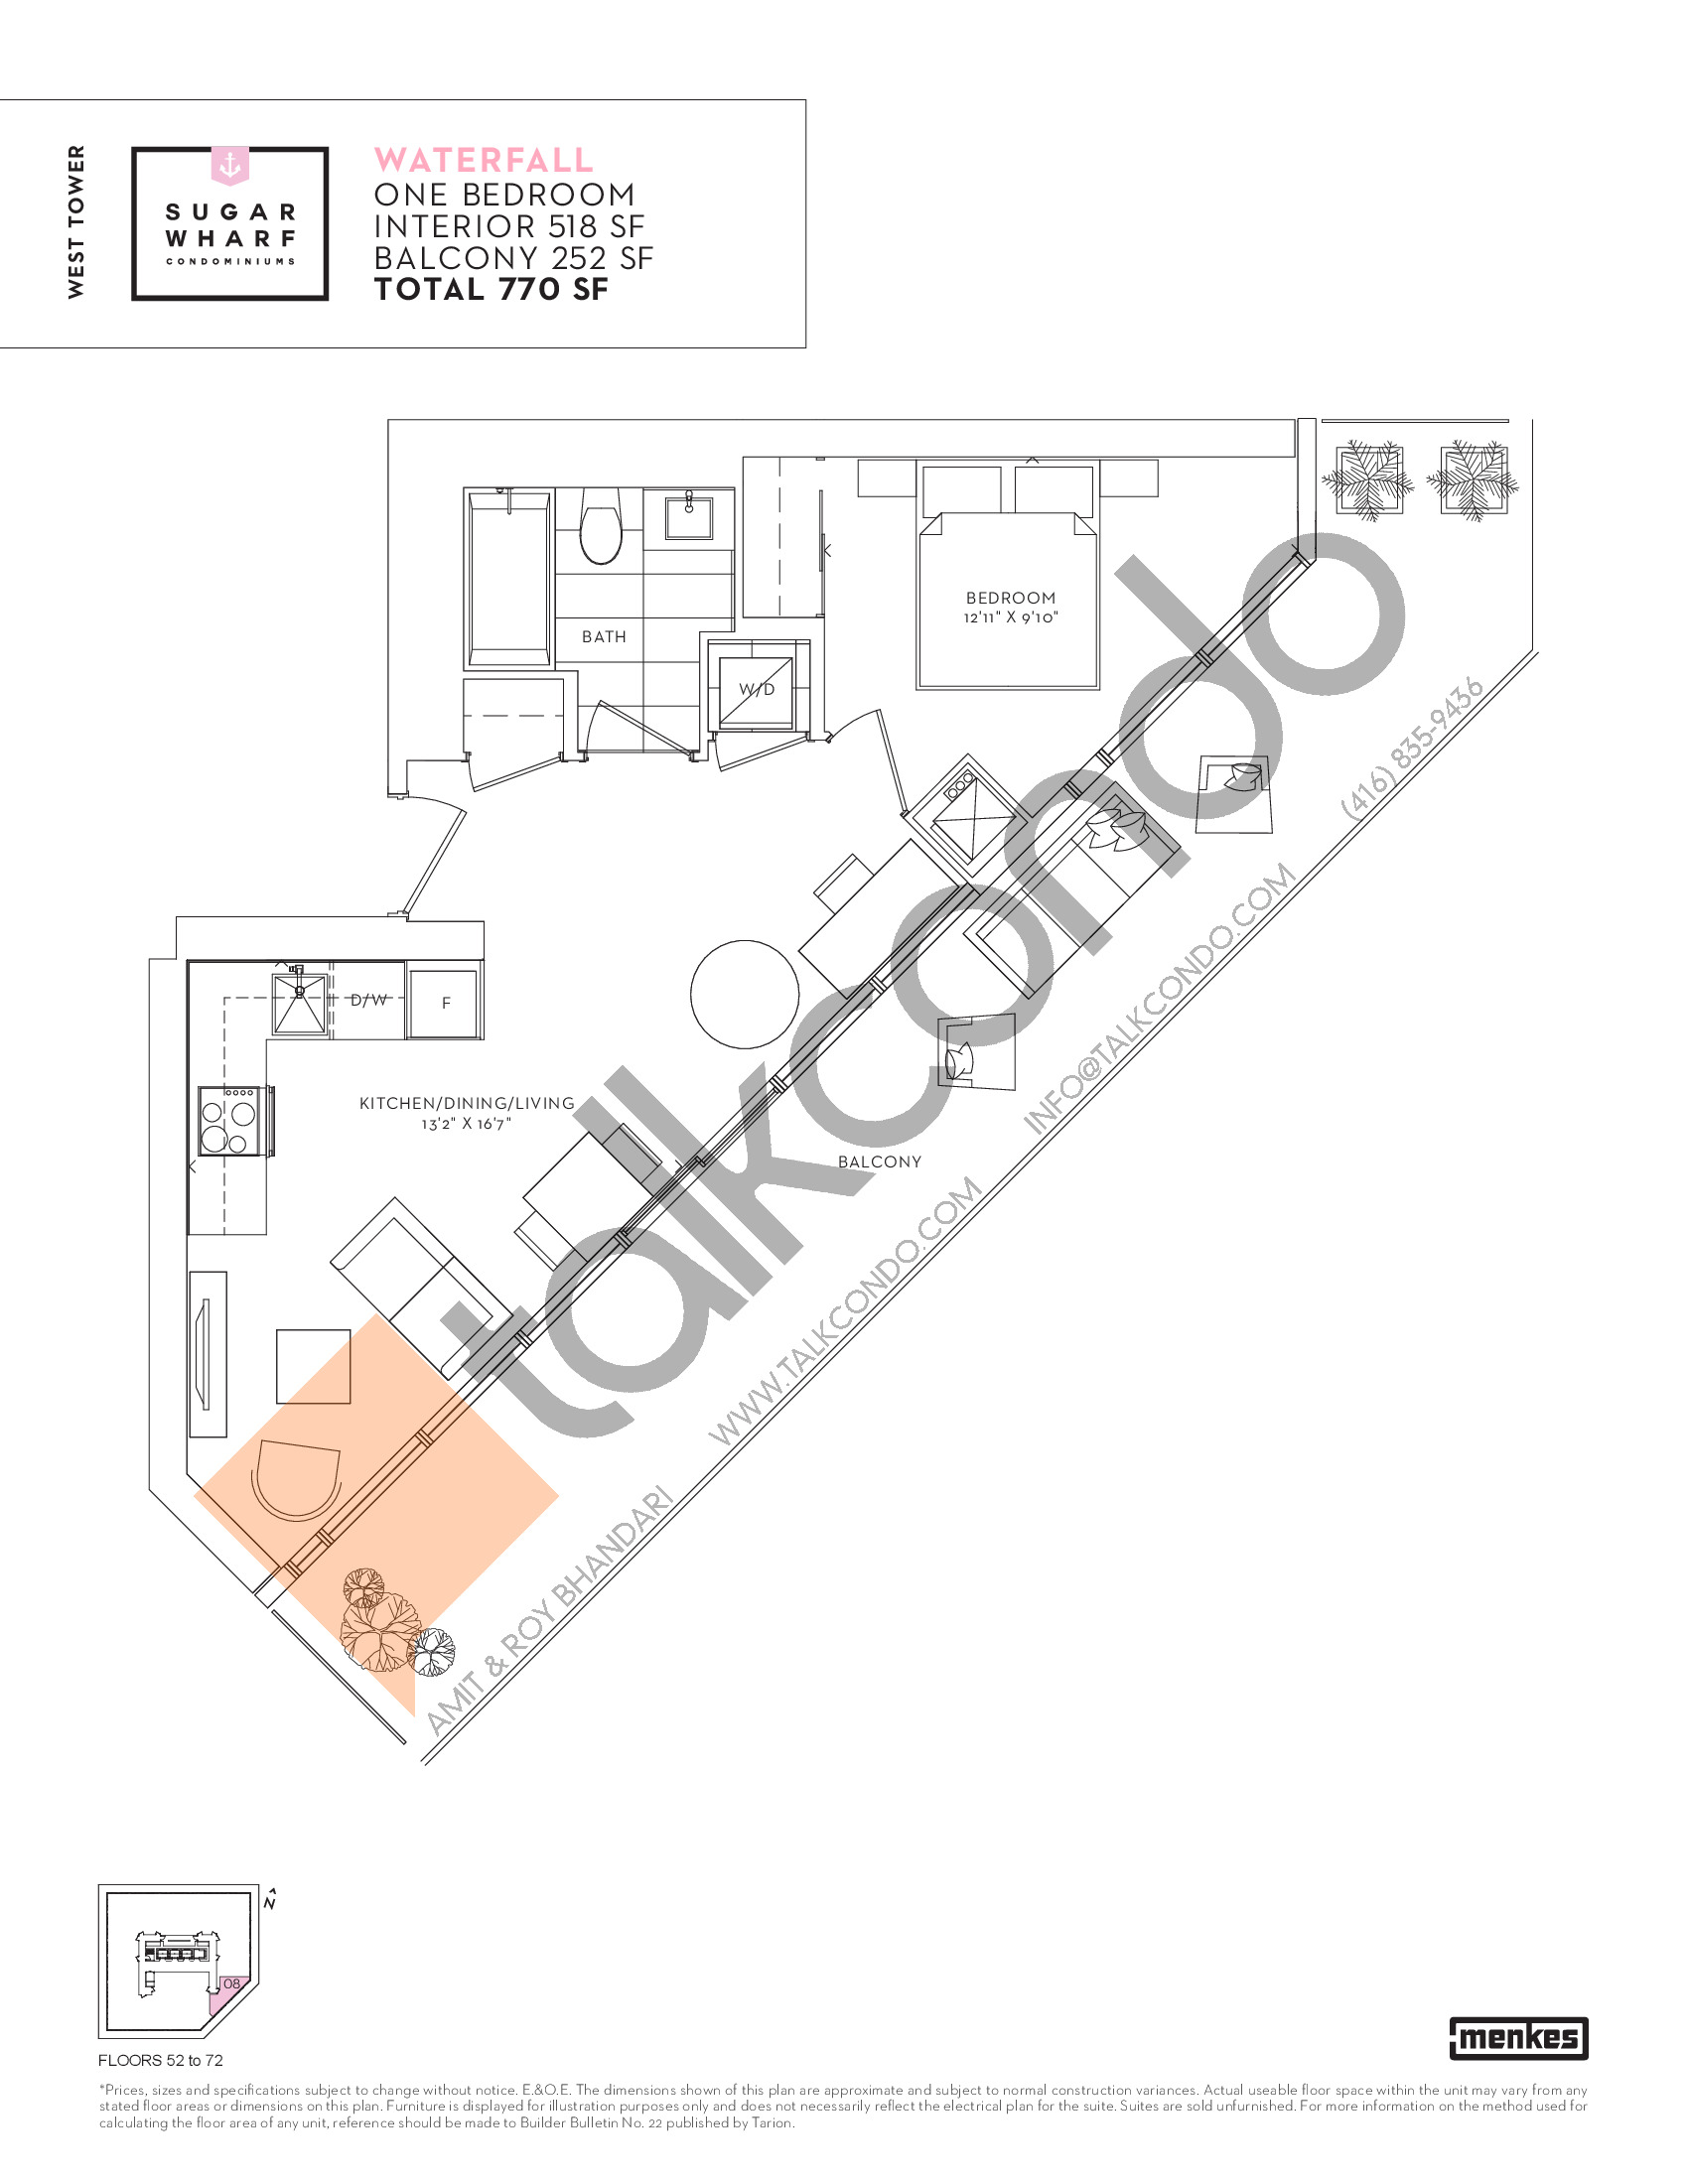 Waterfall Floor Plan at Sugar Wharf Condos West Tower - 518 sq.ft